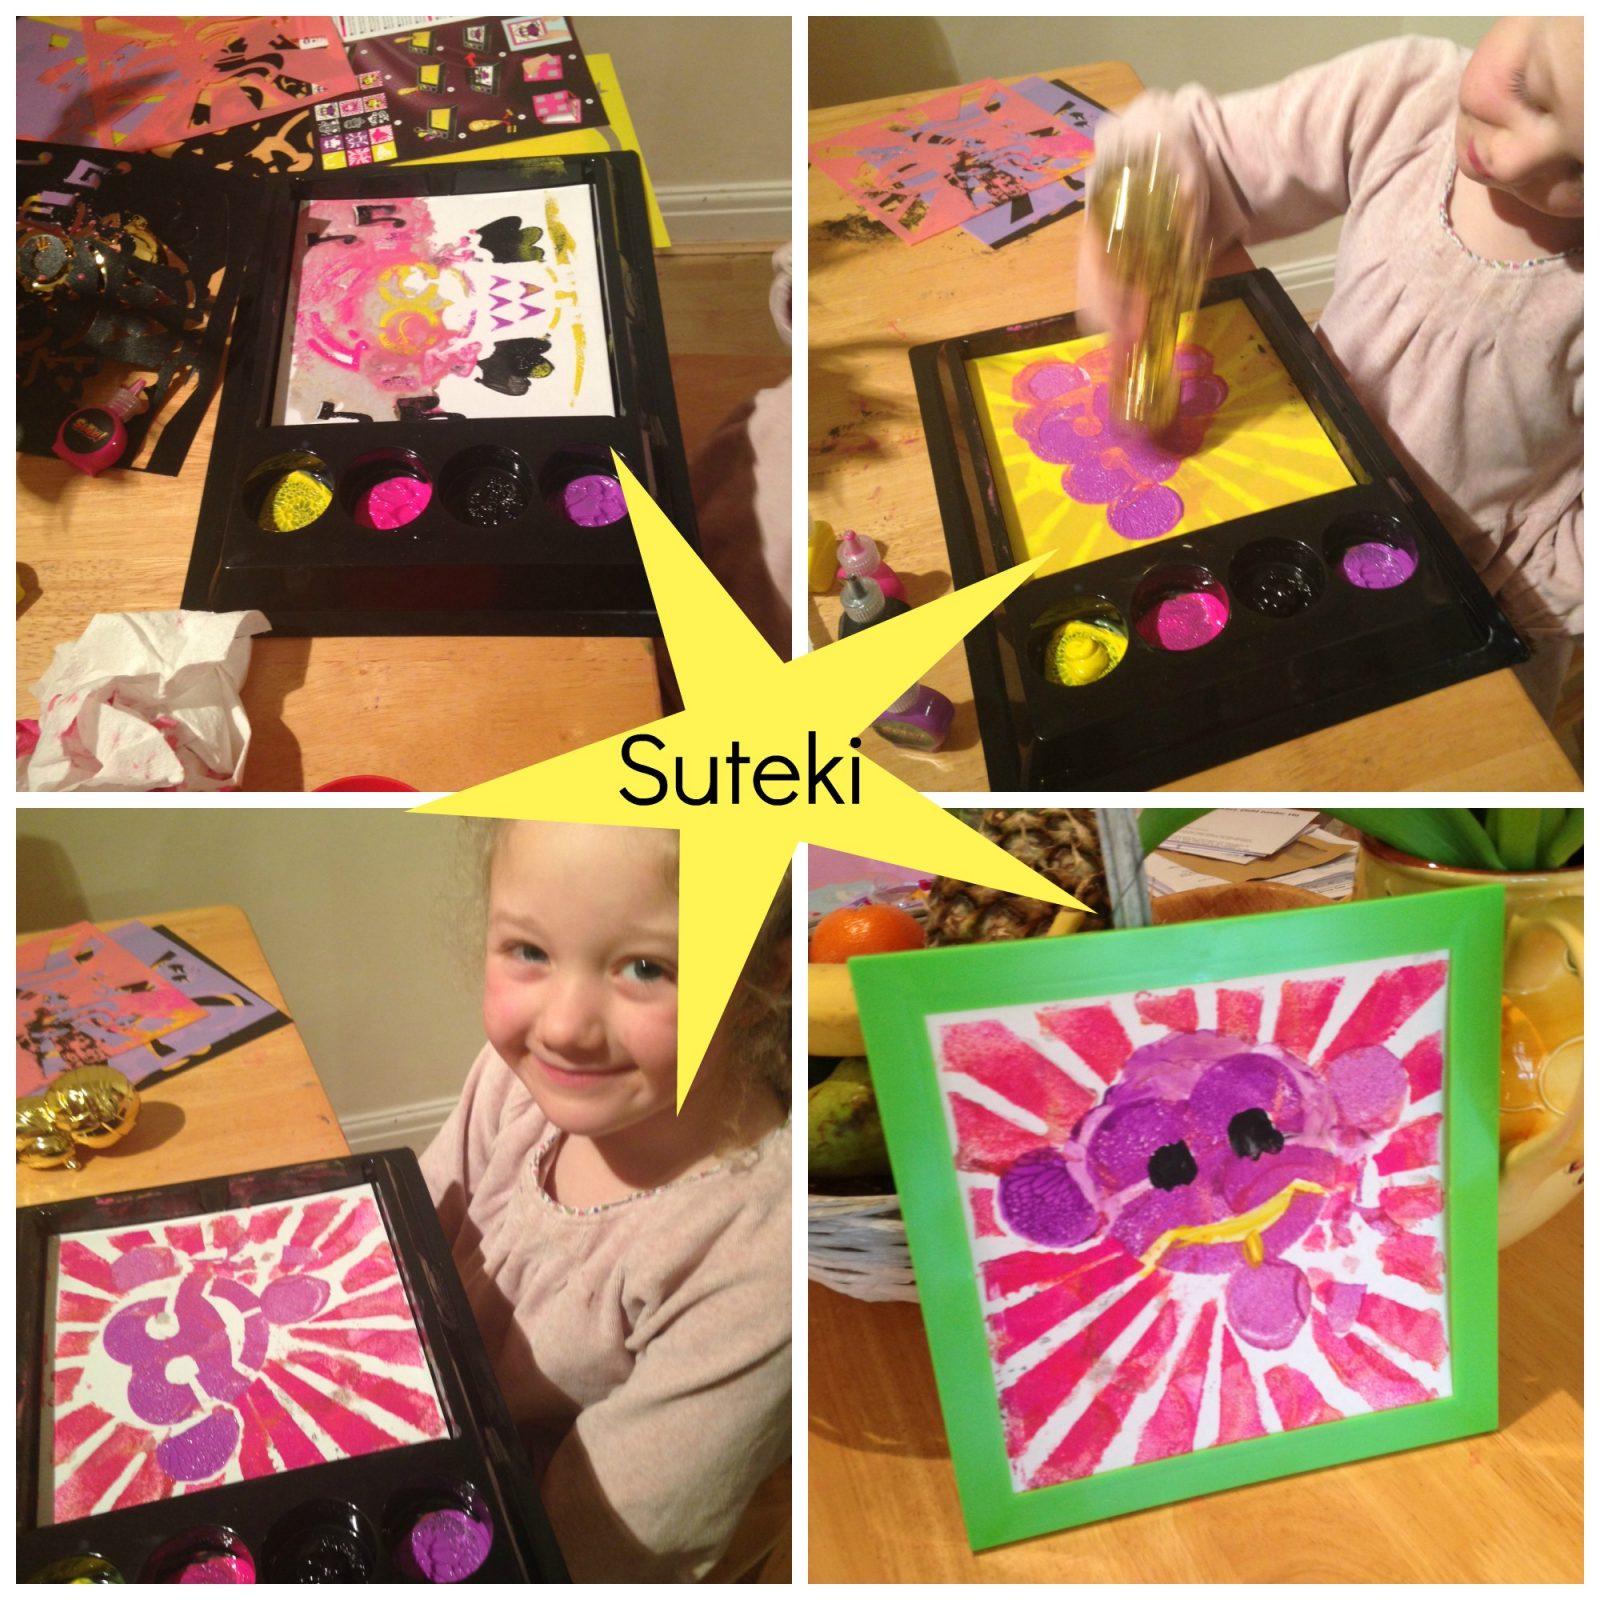 Review: Cool Create Suteki Mega Stencil Station